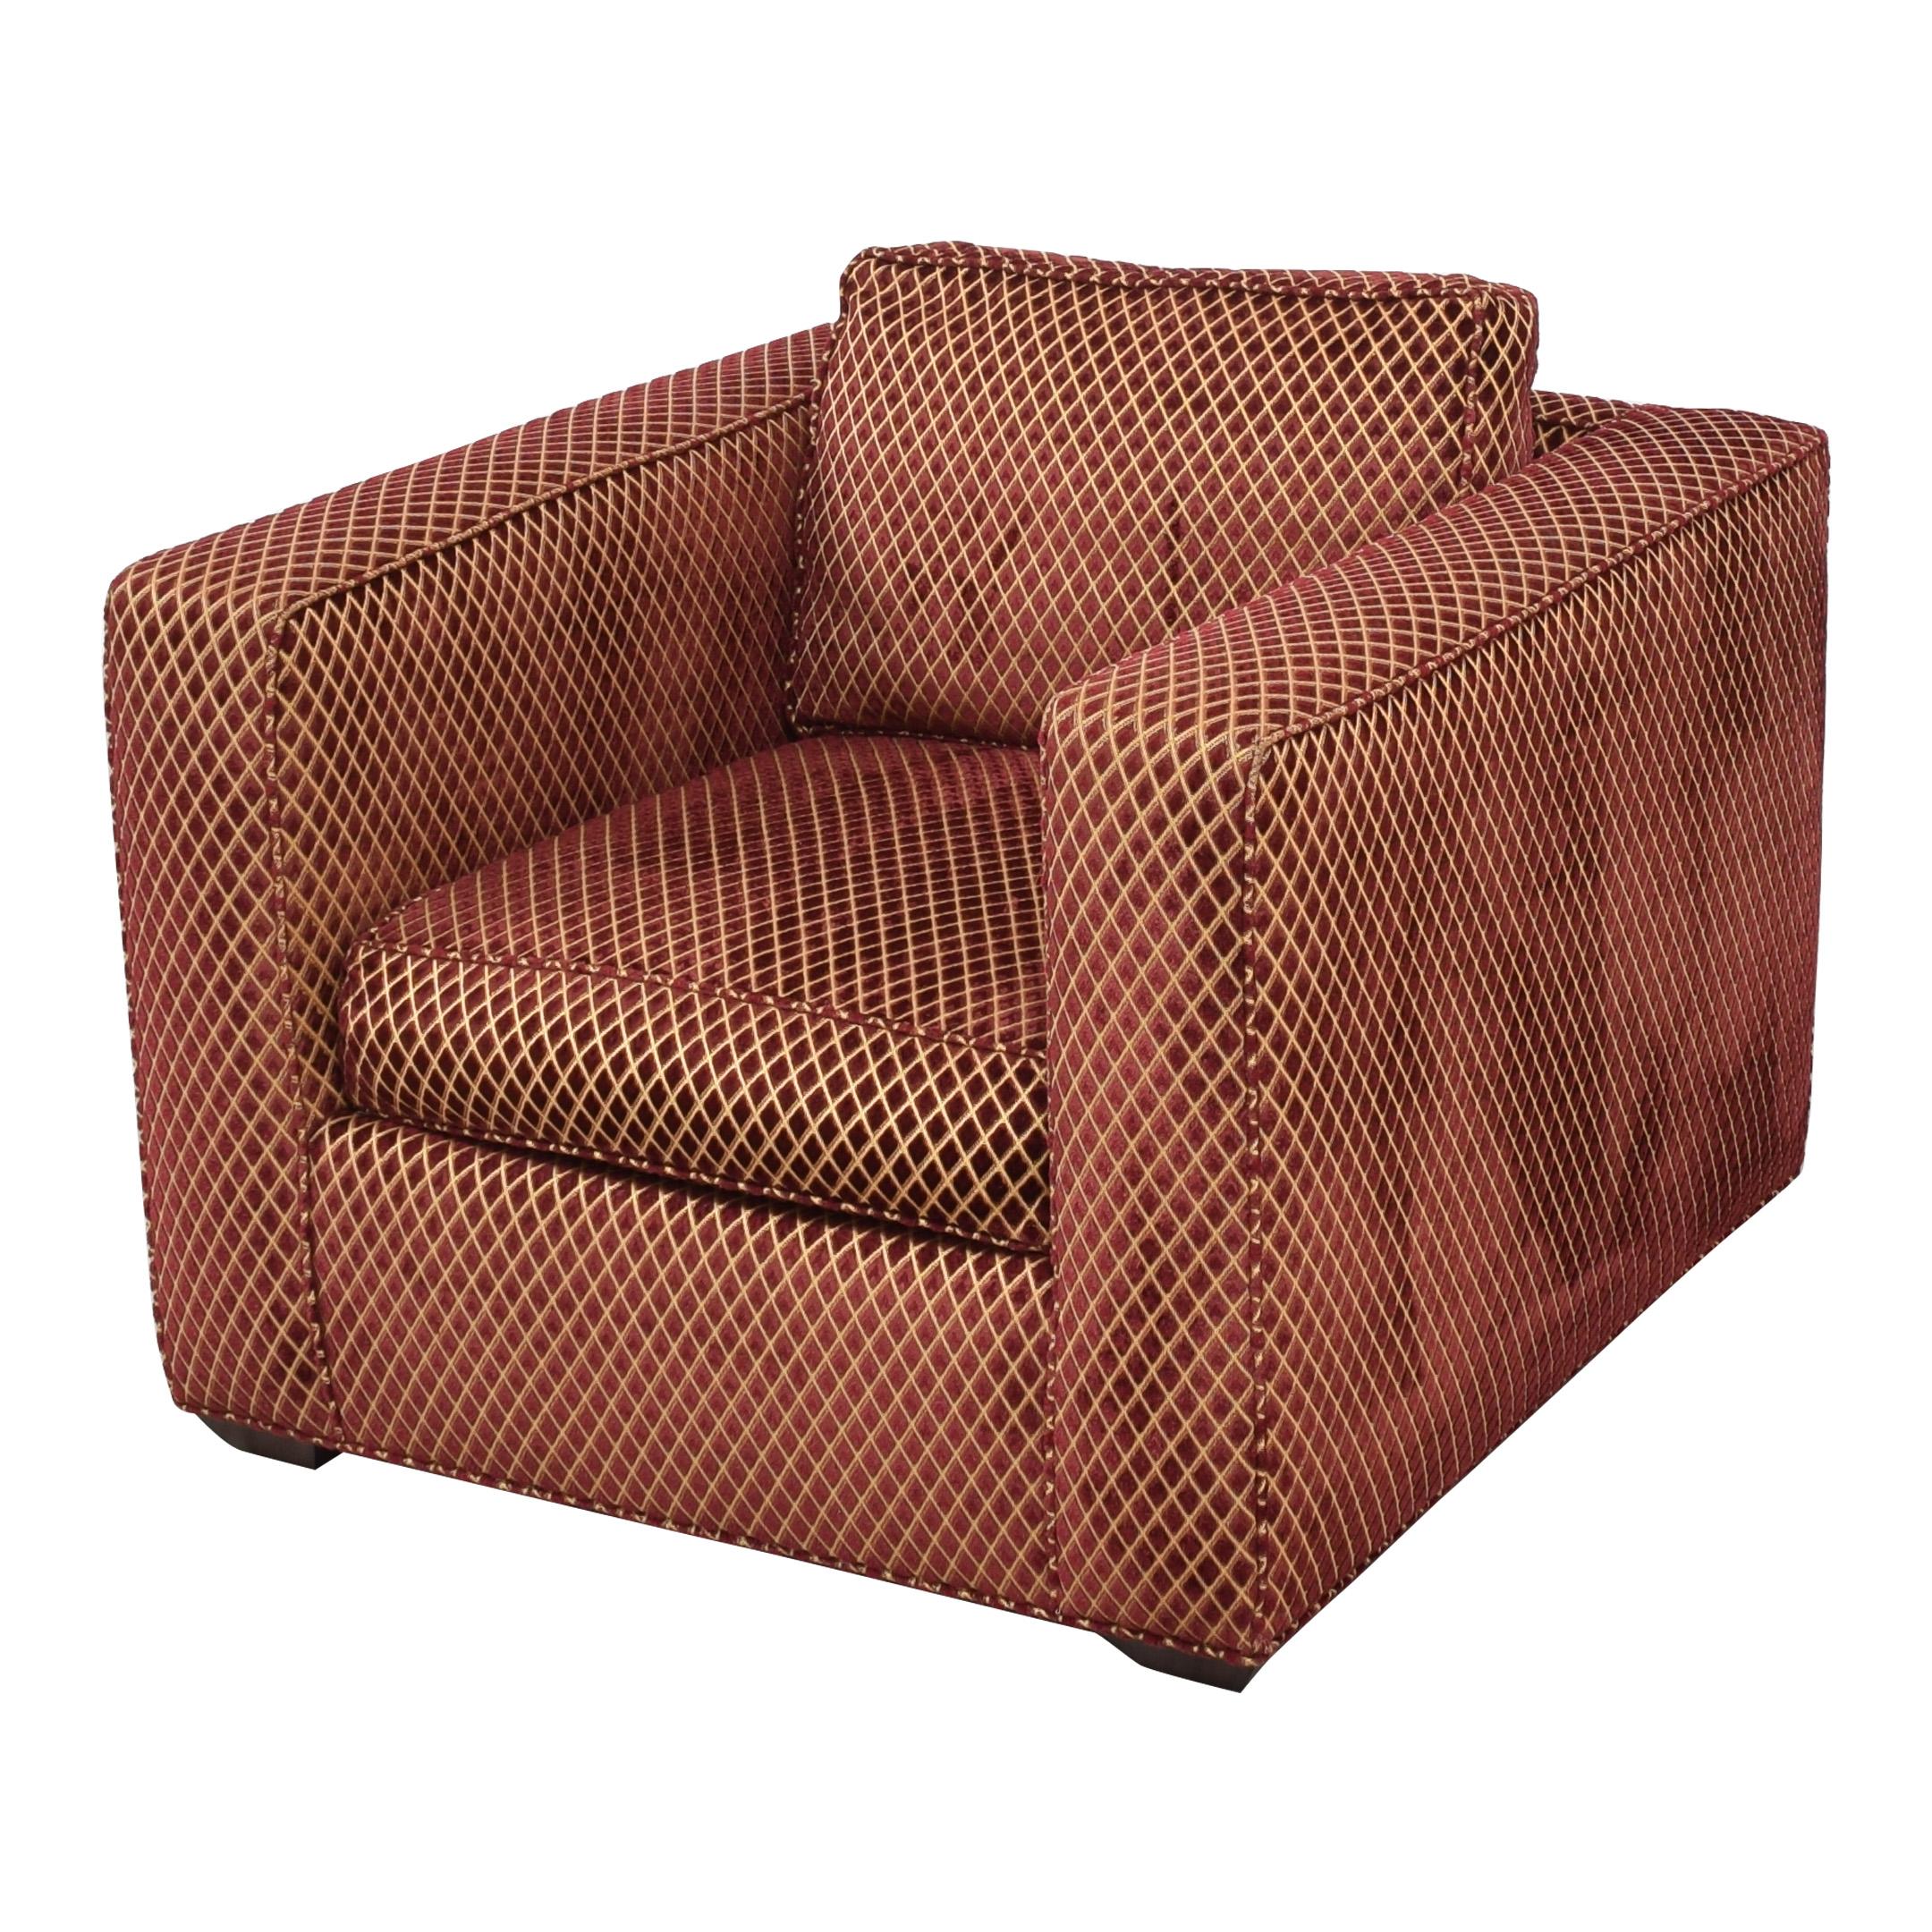 R.Jones R.Jones Club Lounge Chair red